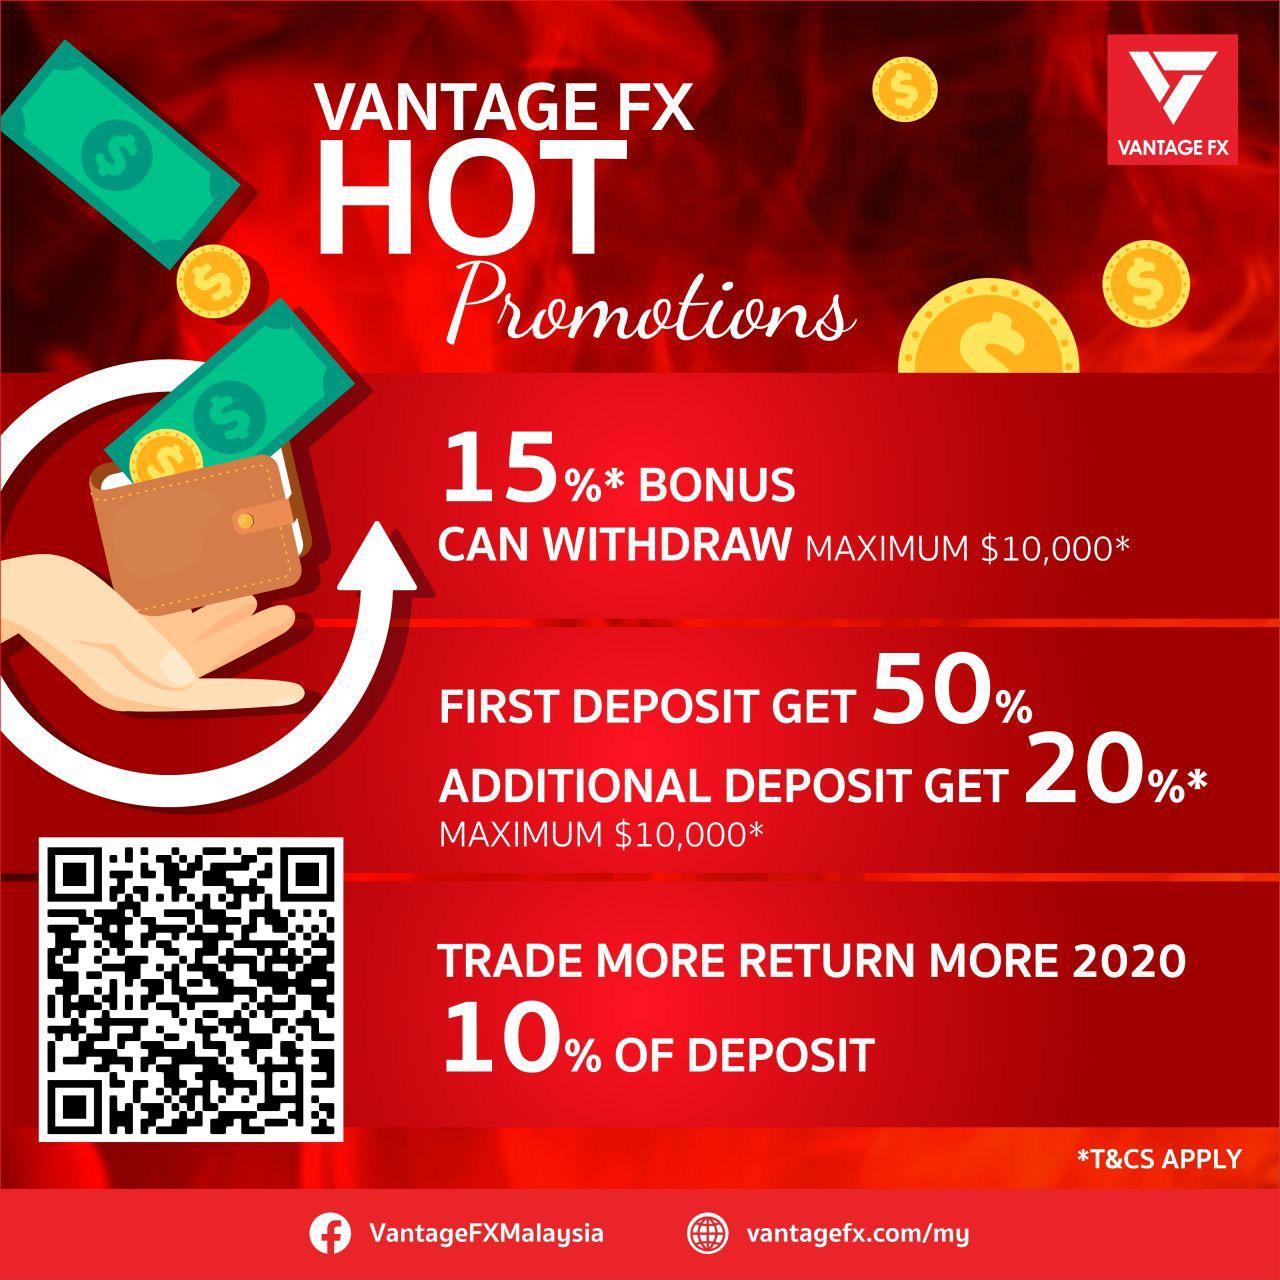 Vantage FX 50% Deposit Bonus - Deposit $50 Get Bonus $25